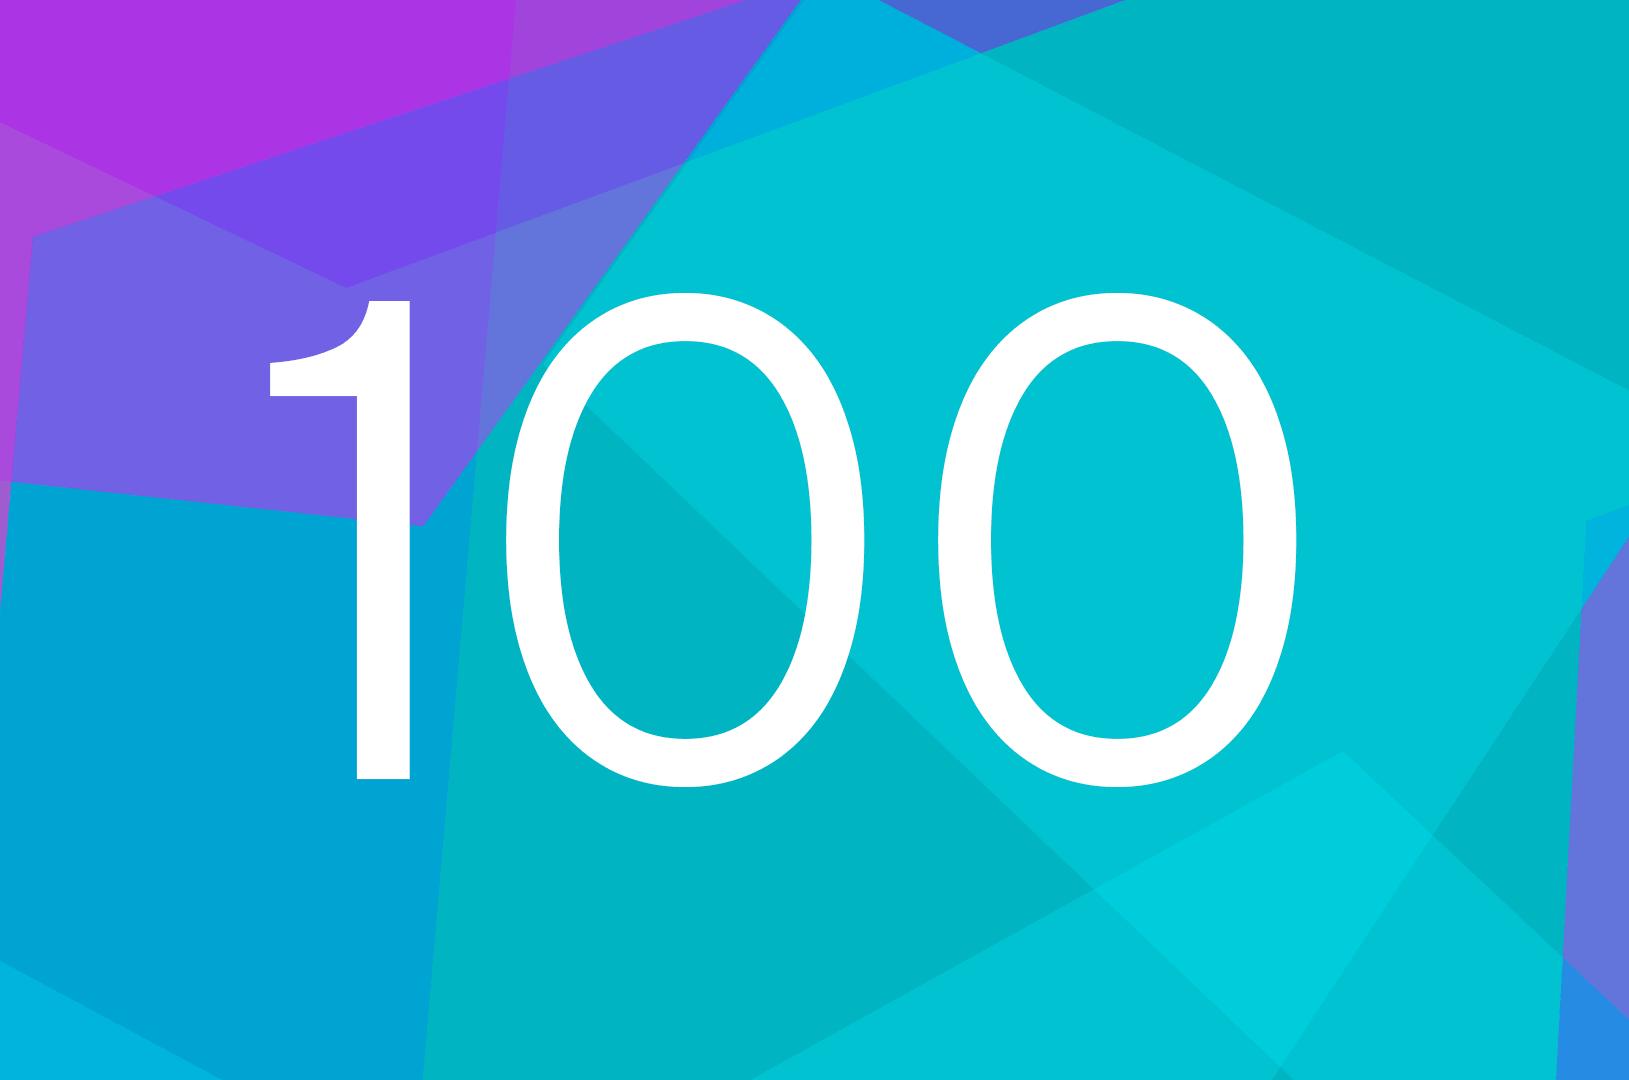 180910 - 100